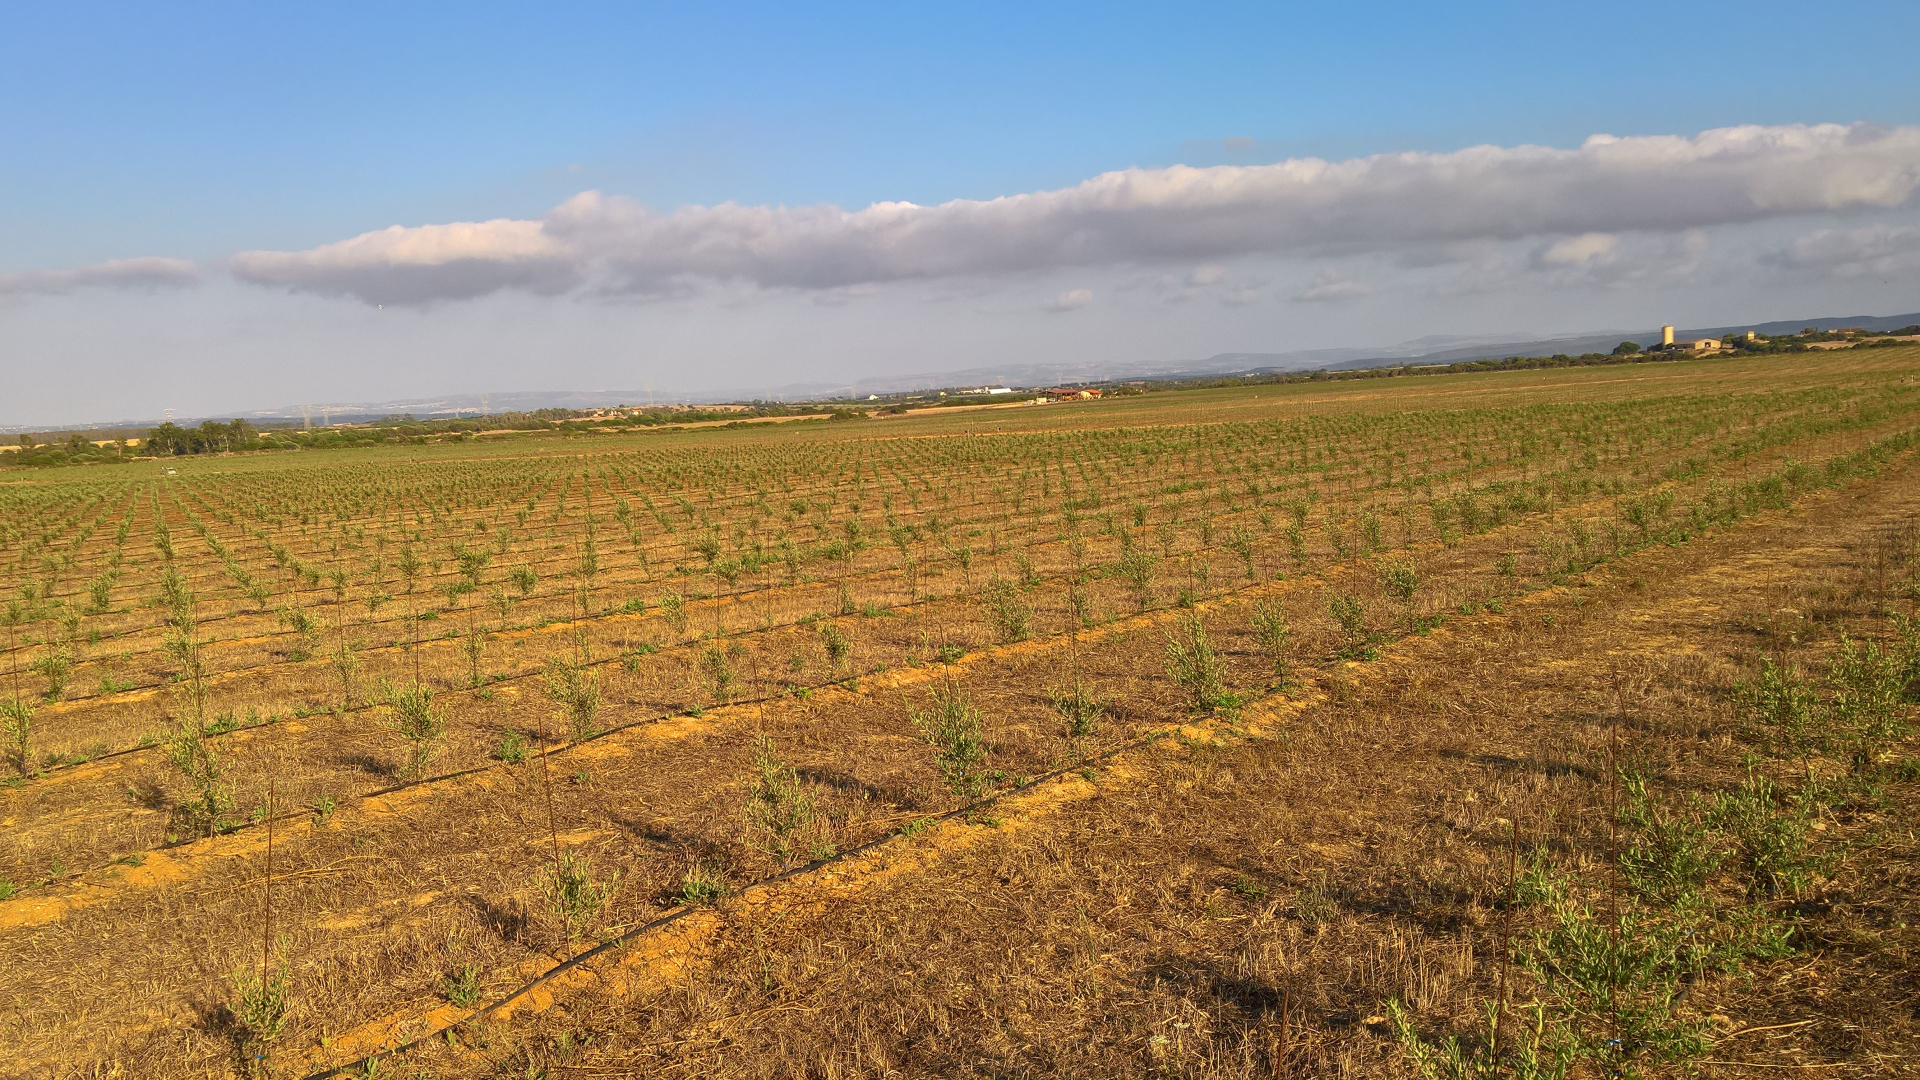 Olivicoltura intensiva in Sardegna